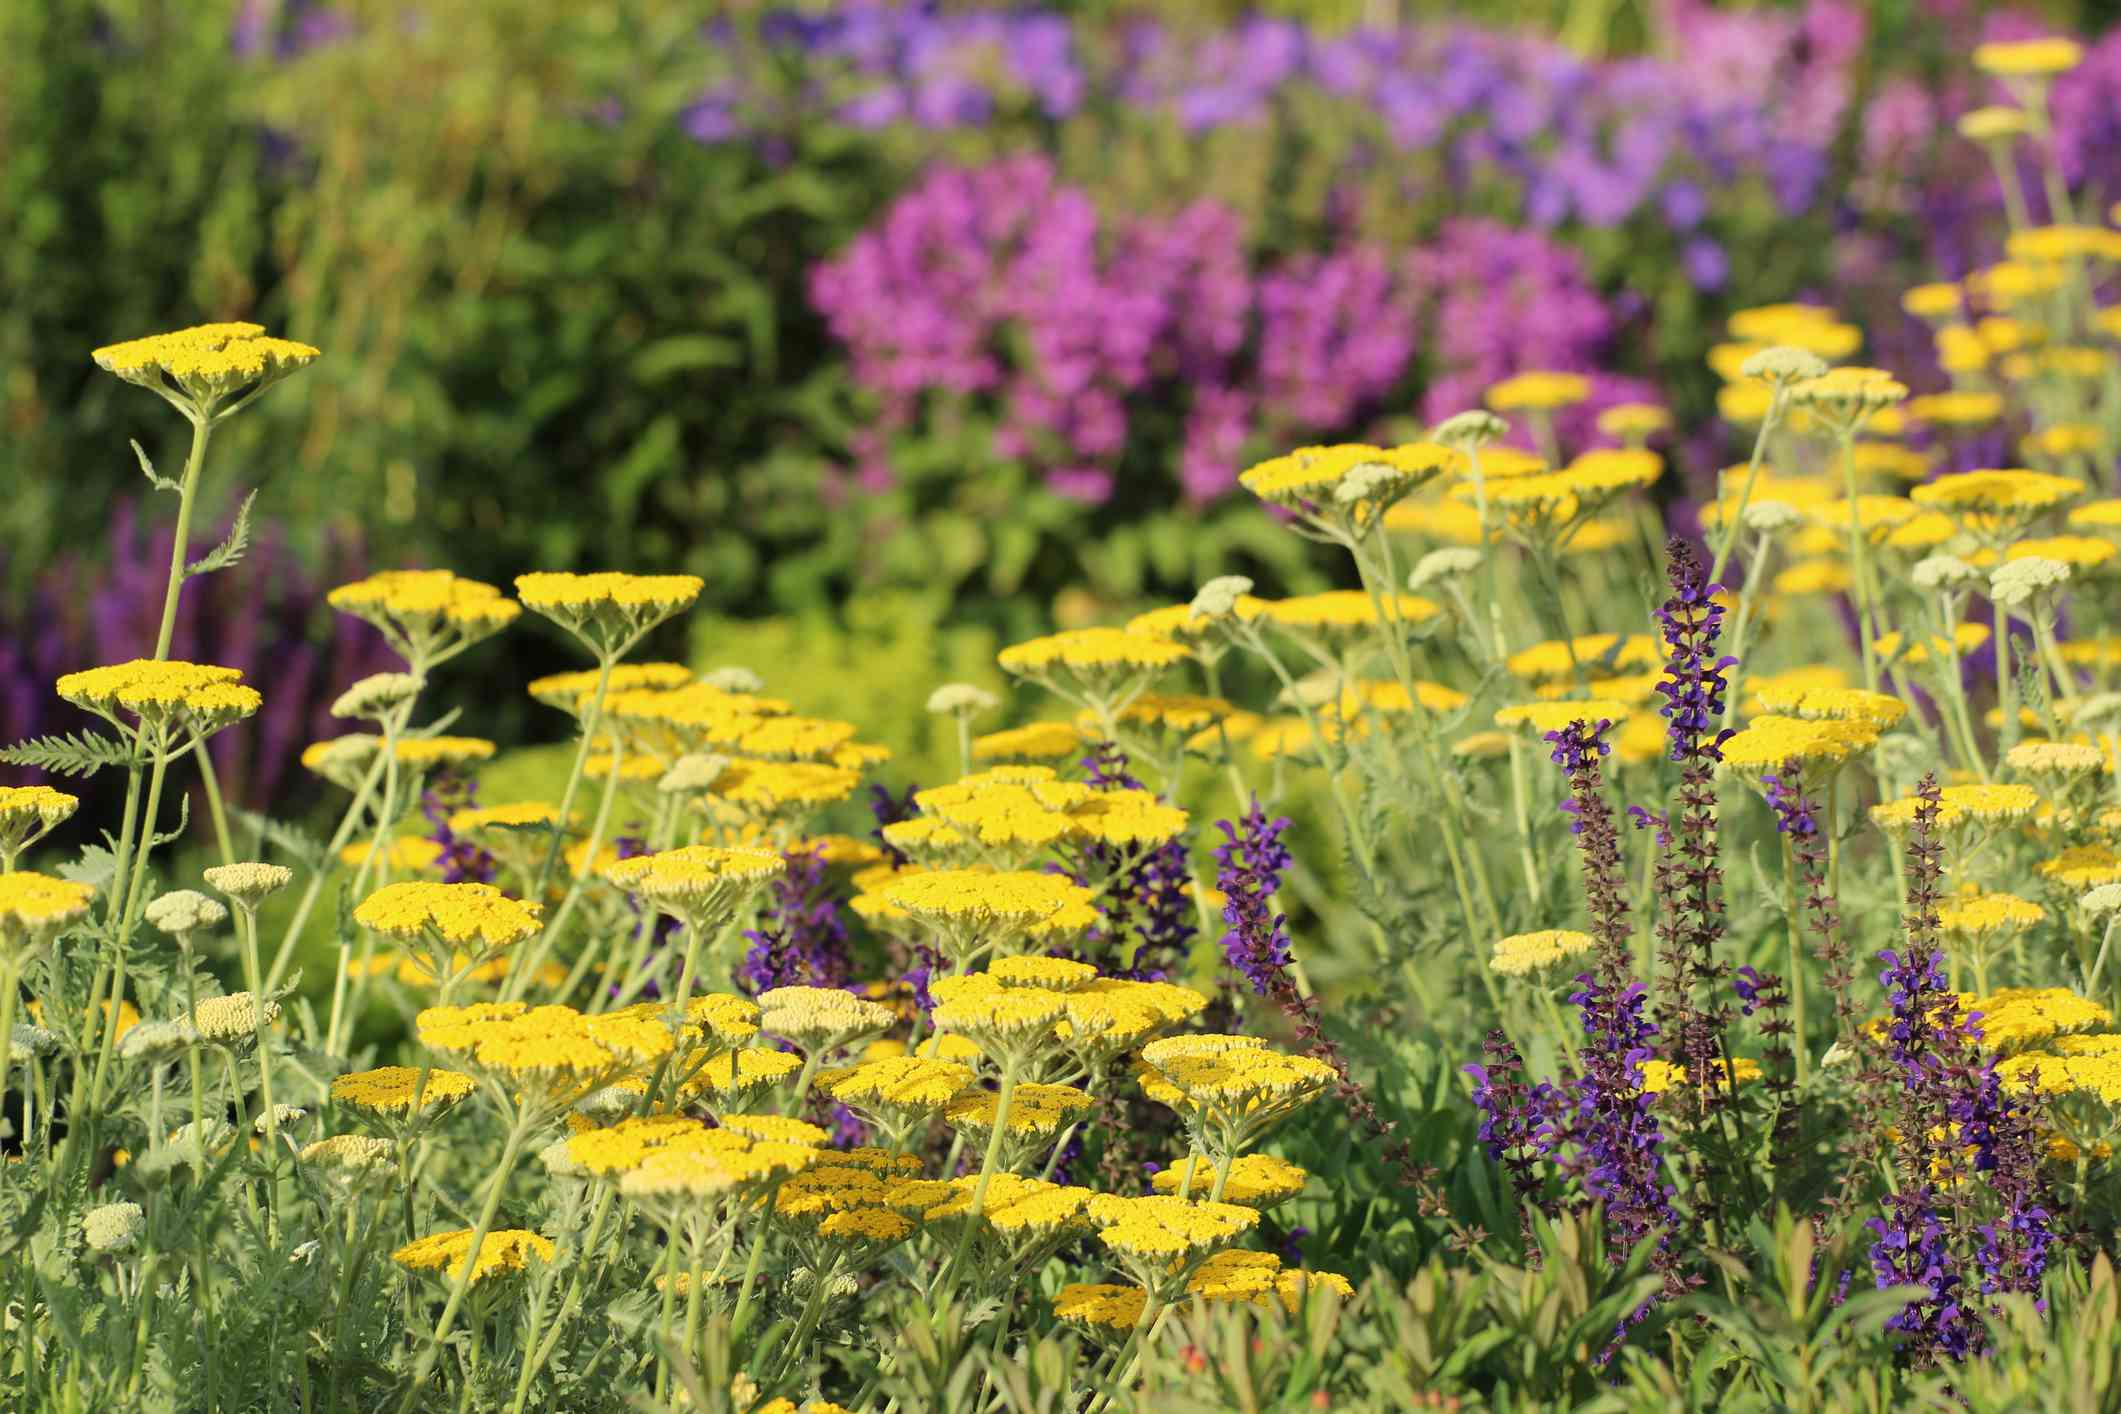 Wildflowers in garden.